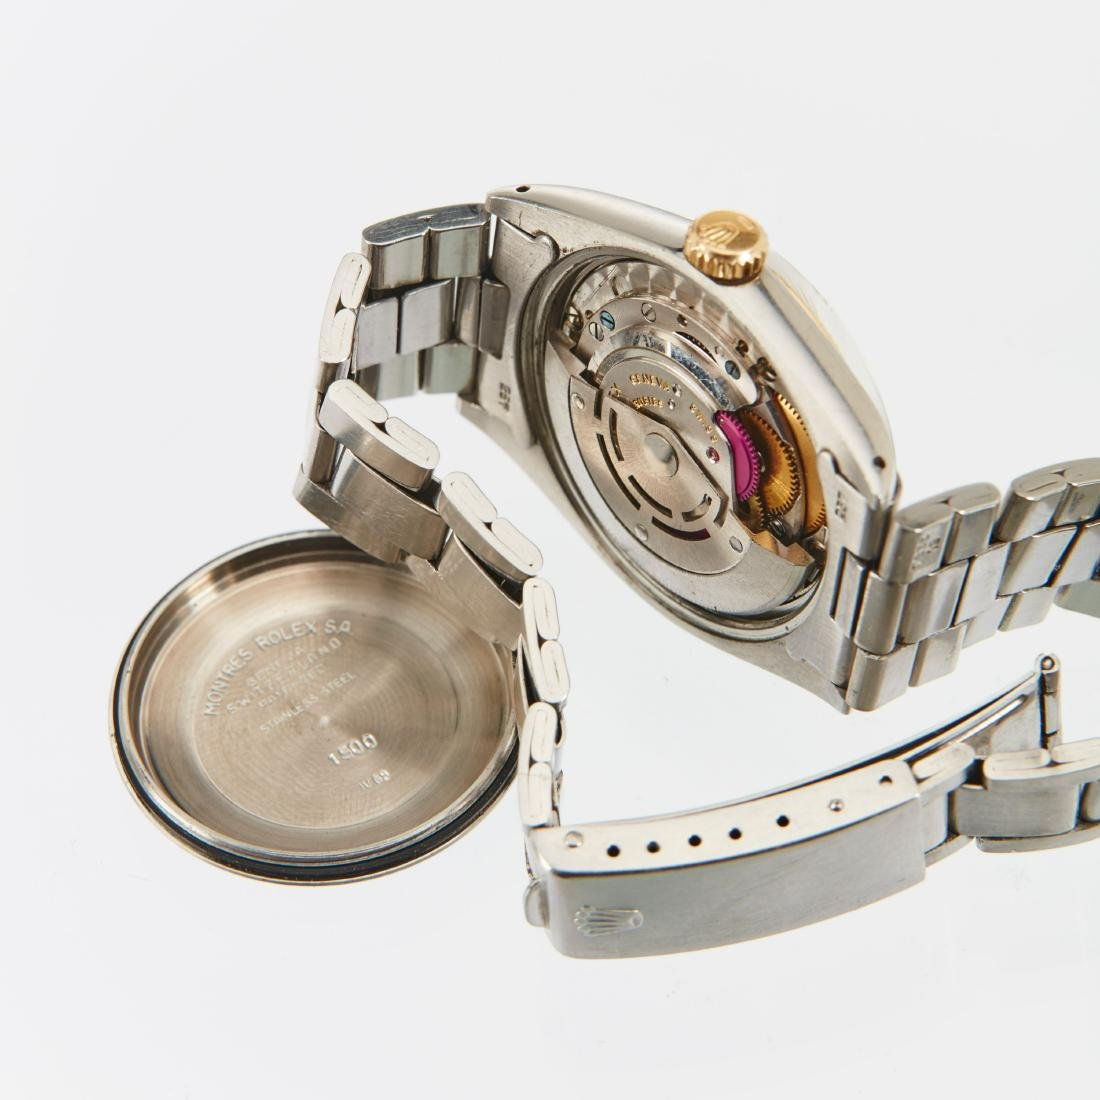 Rolex, Air King Date, Ref. 5701 - 3